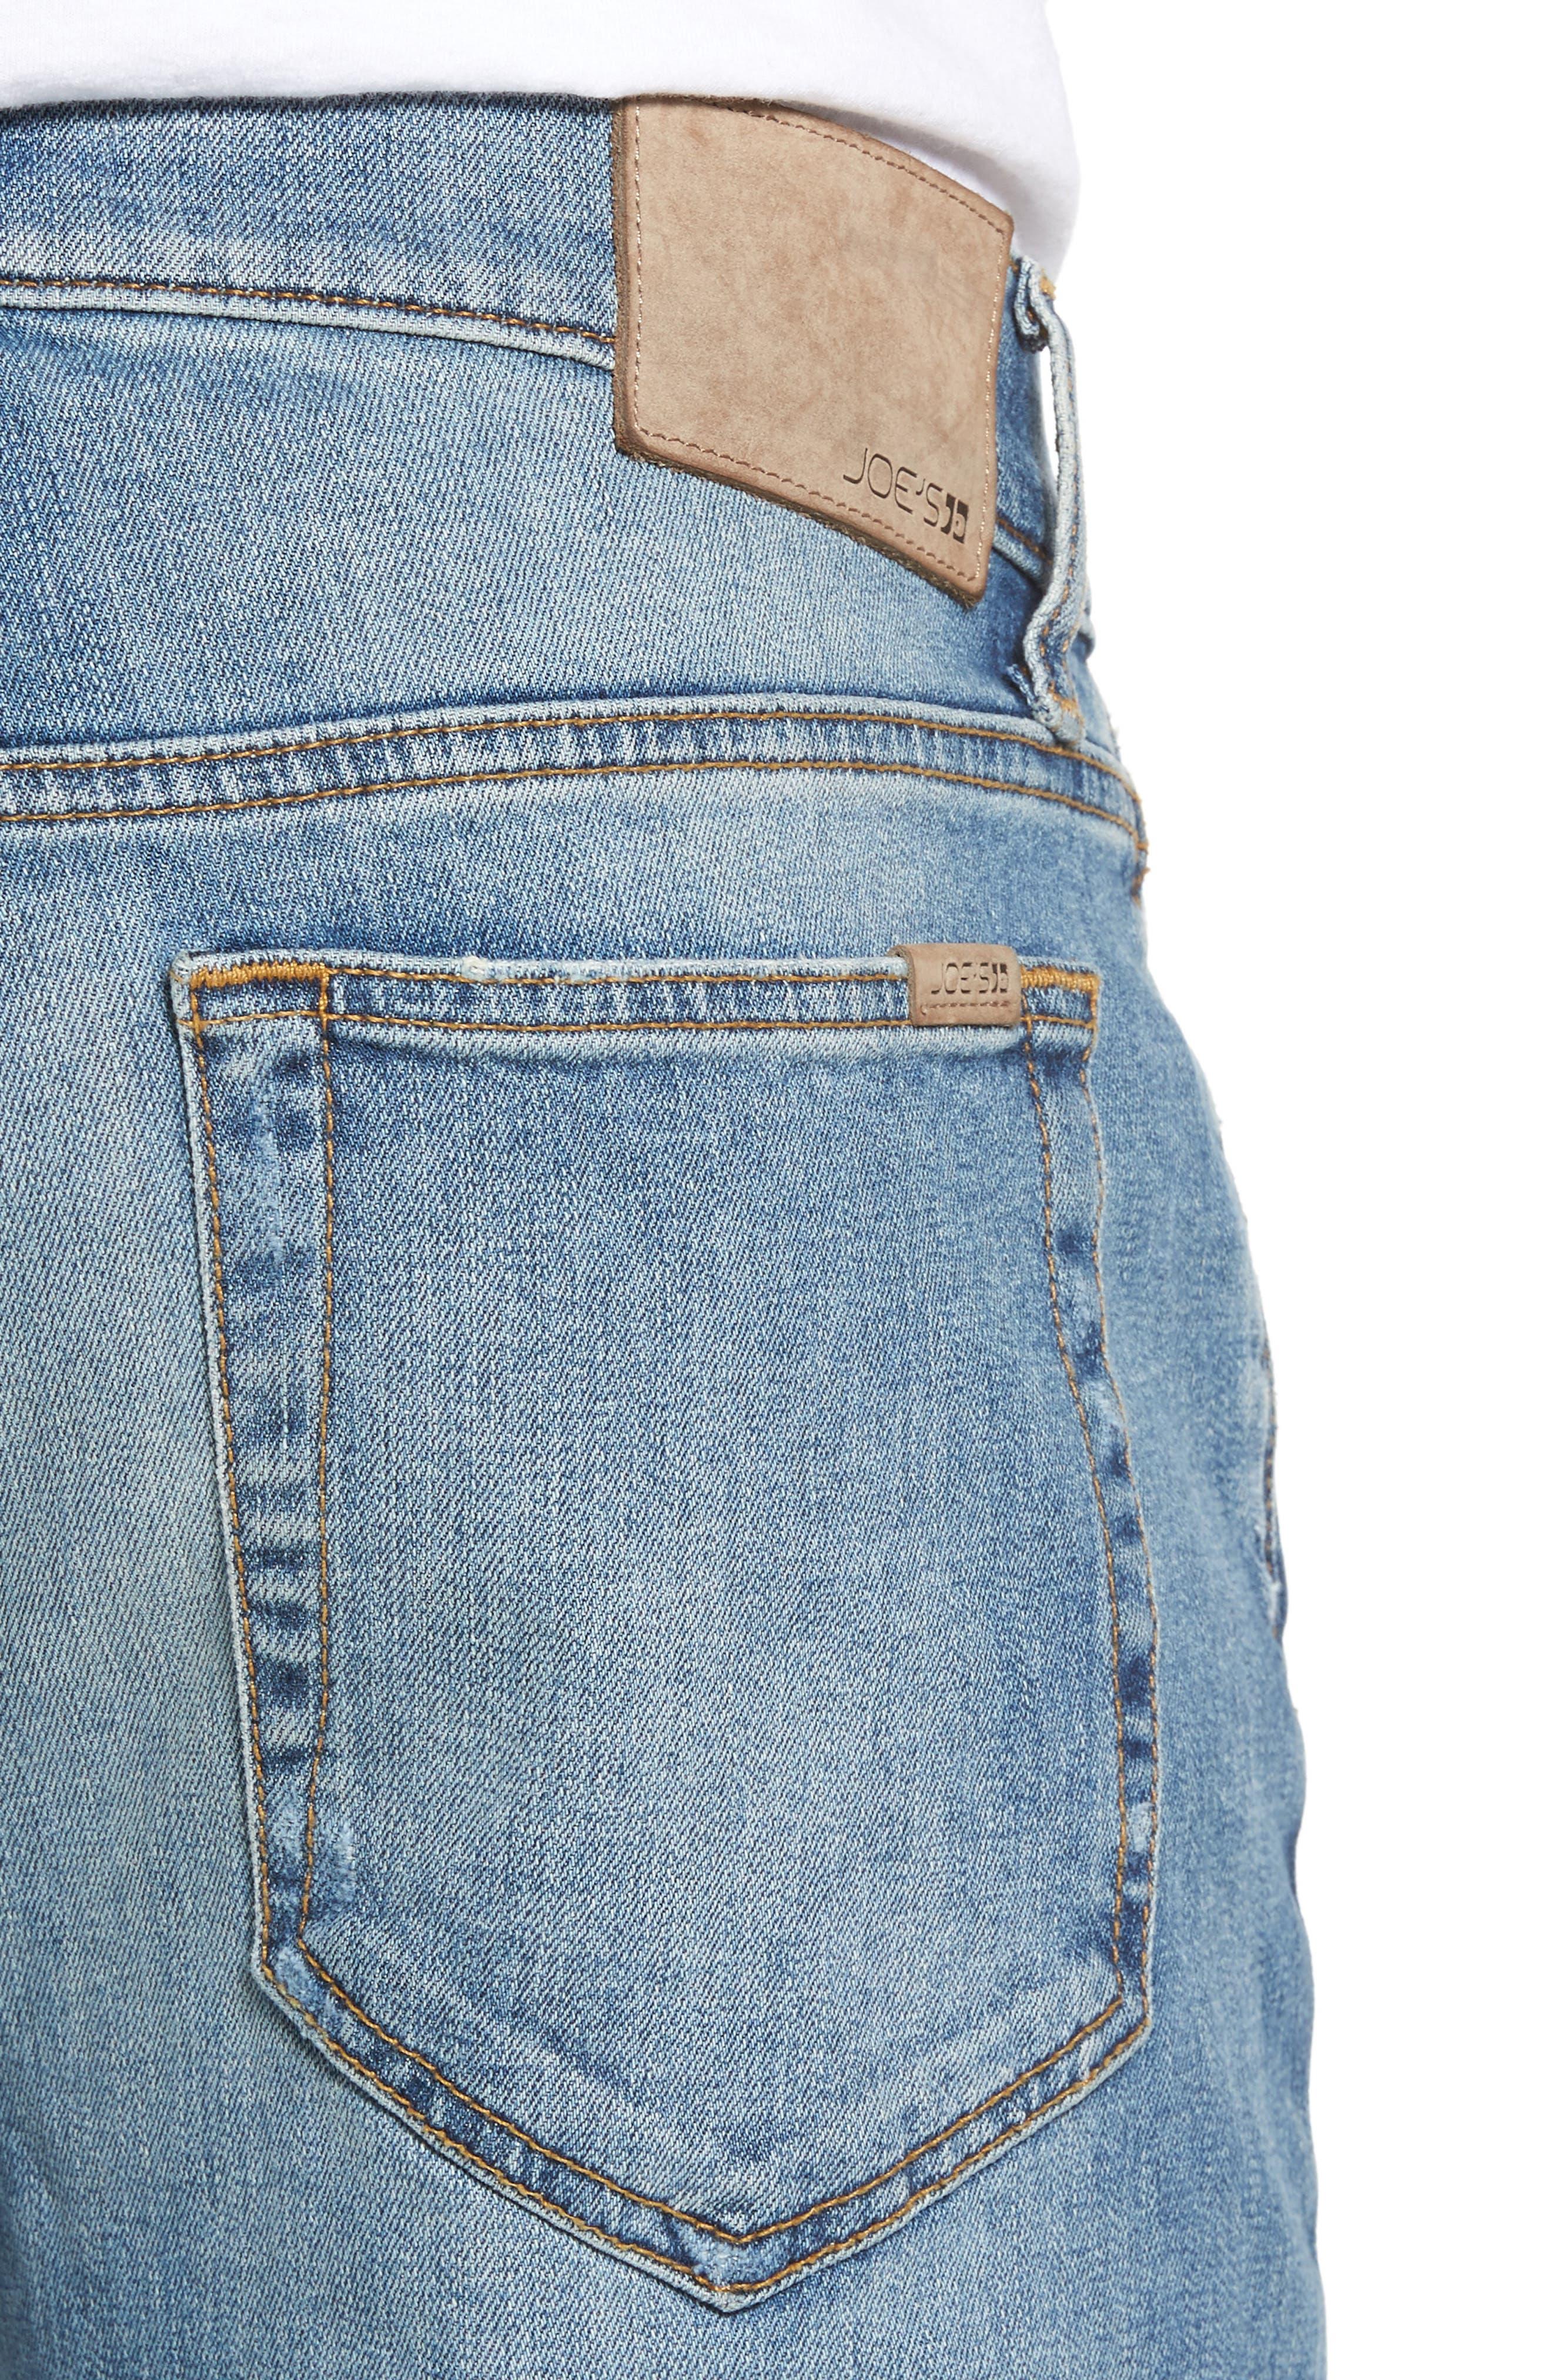 Brixton Slim Straight Fit Jeans,                             Alternate thumbnail 4, color,                             Wyman